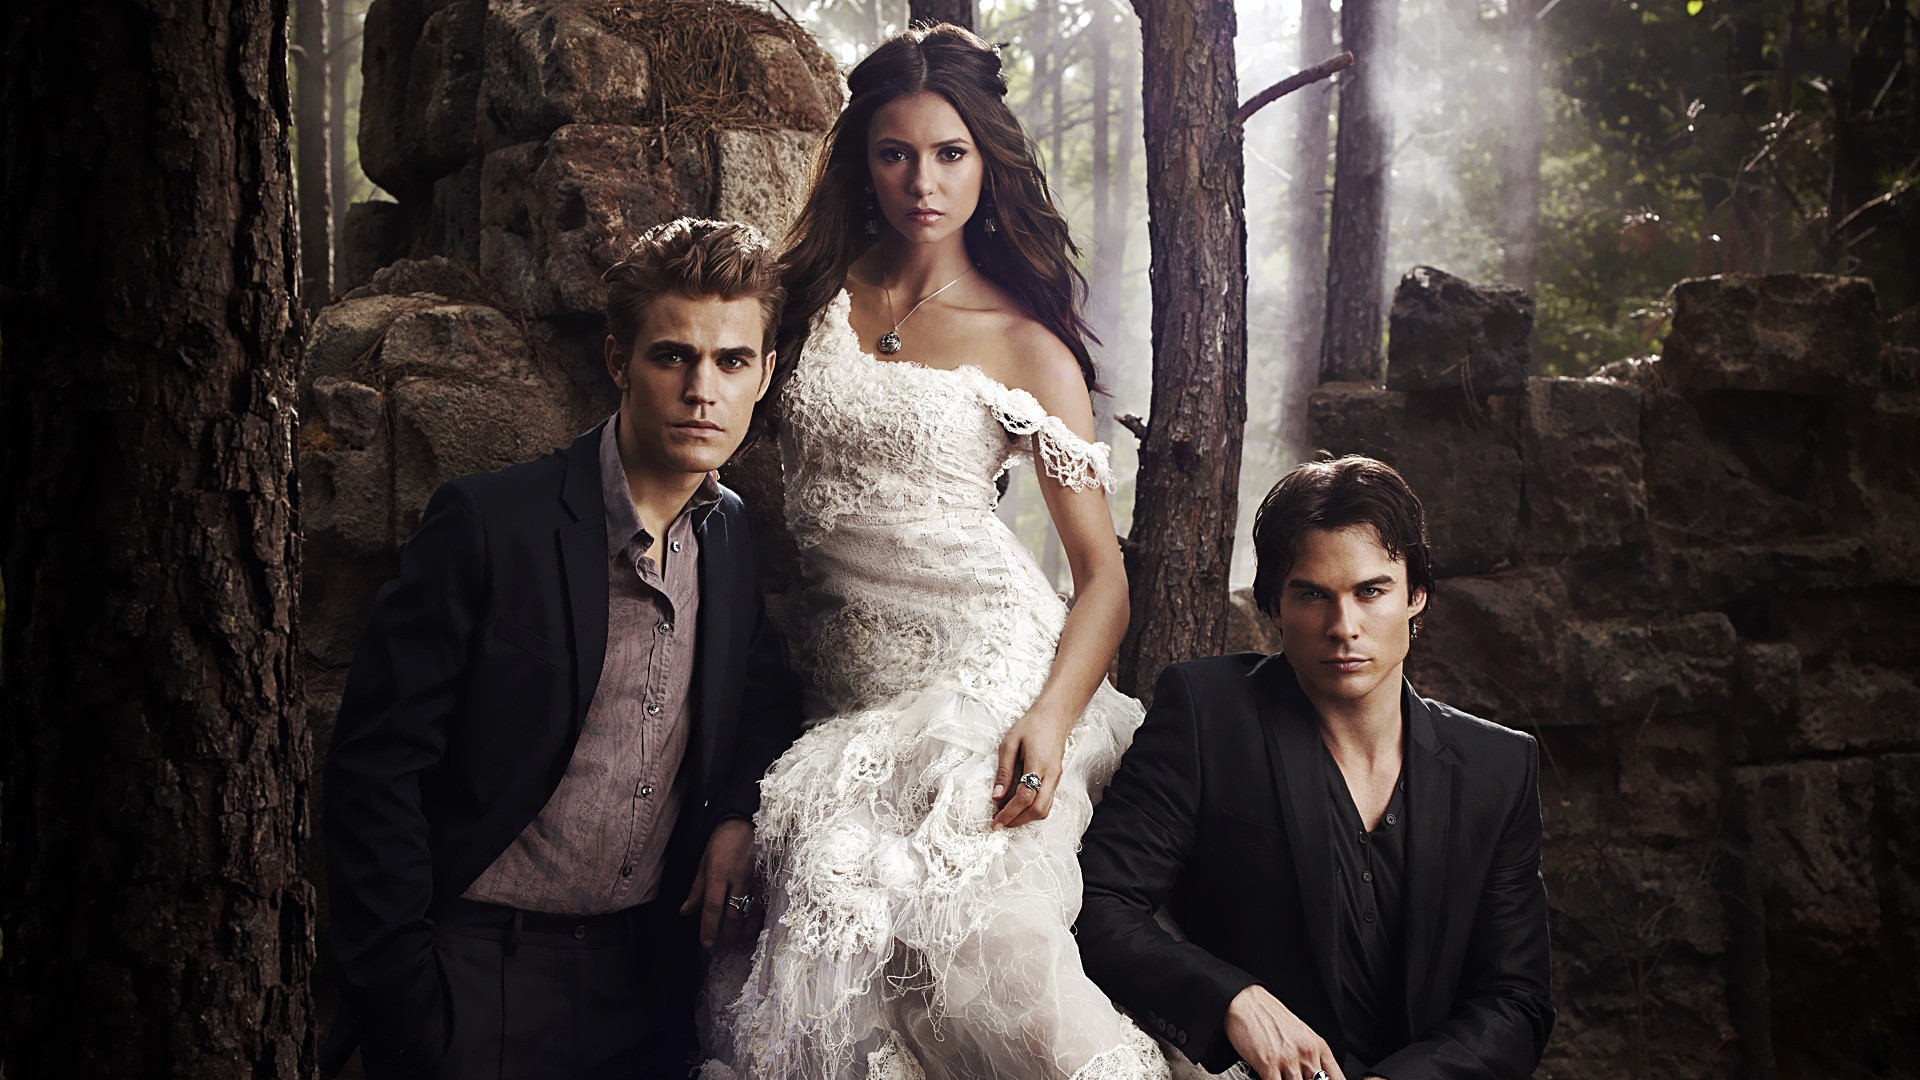 Best The Vampire Diaries Wallpaper   Wallpaper High Definition High 1920x1080